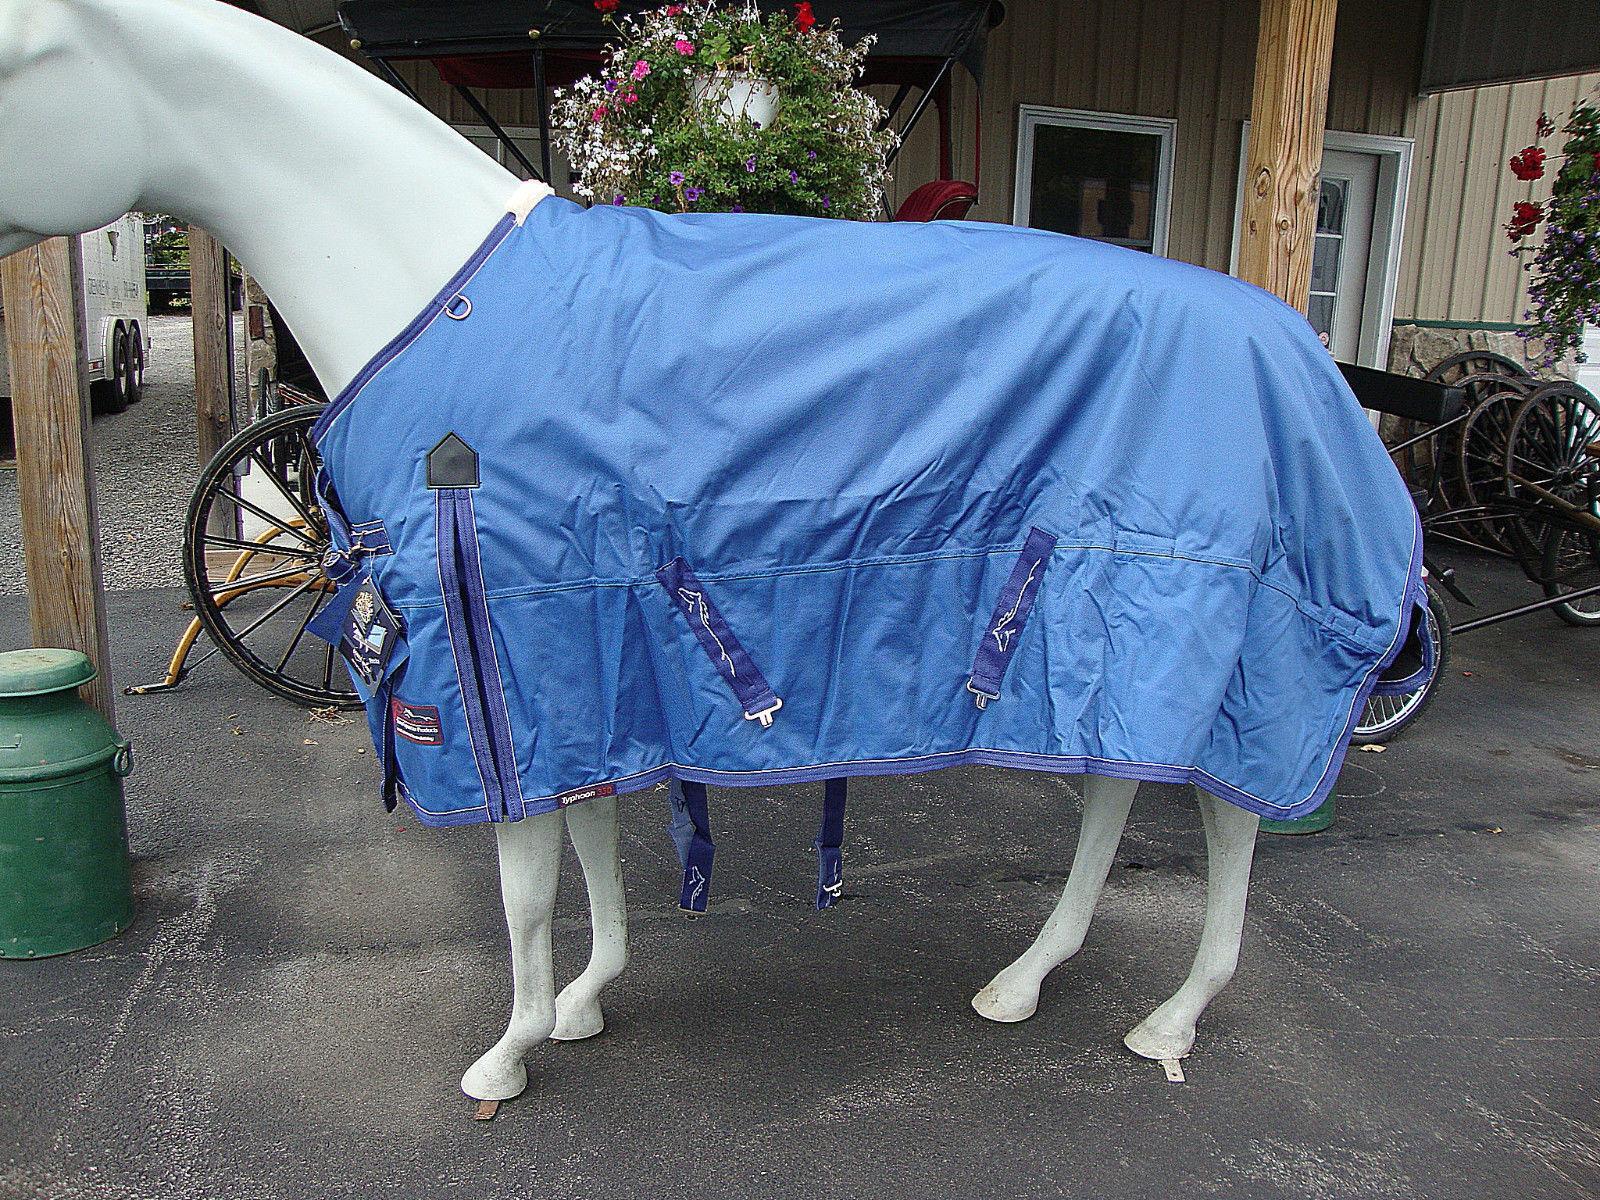 SHIRES EQUESTRIAN TYPHOON HORSE BLANKET SIZE 69  (330 GRAM)